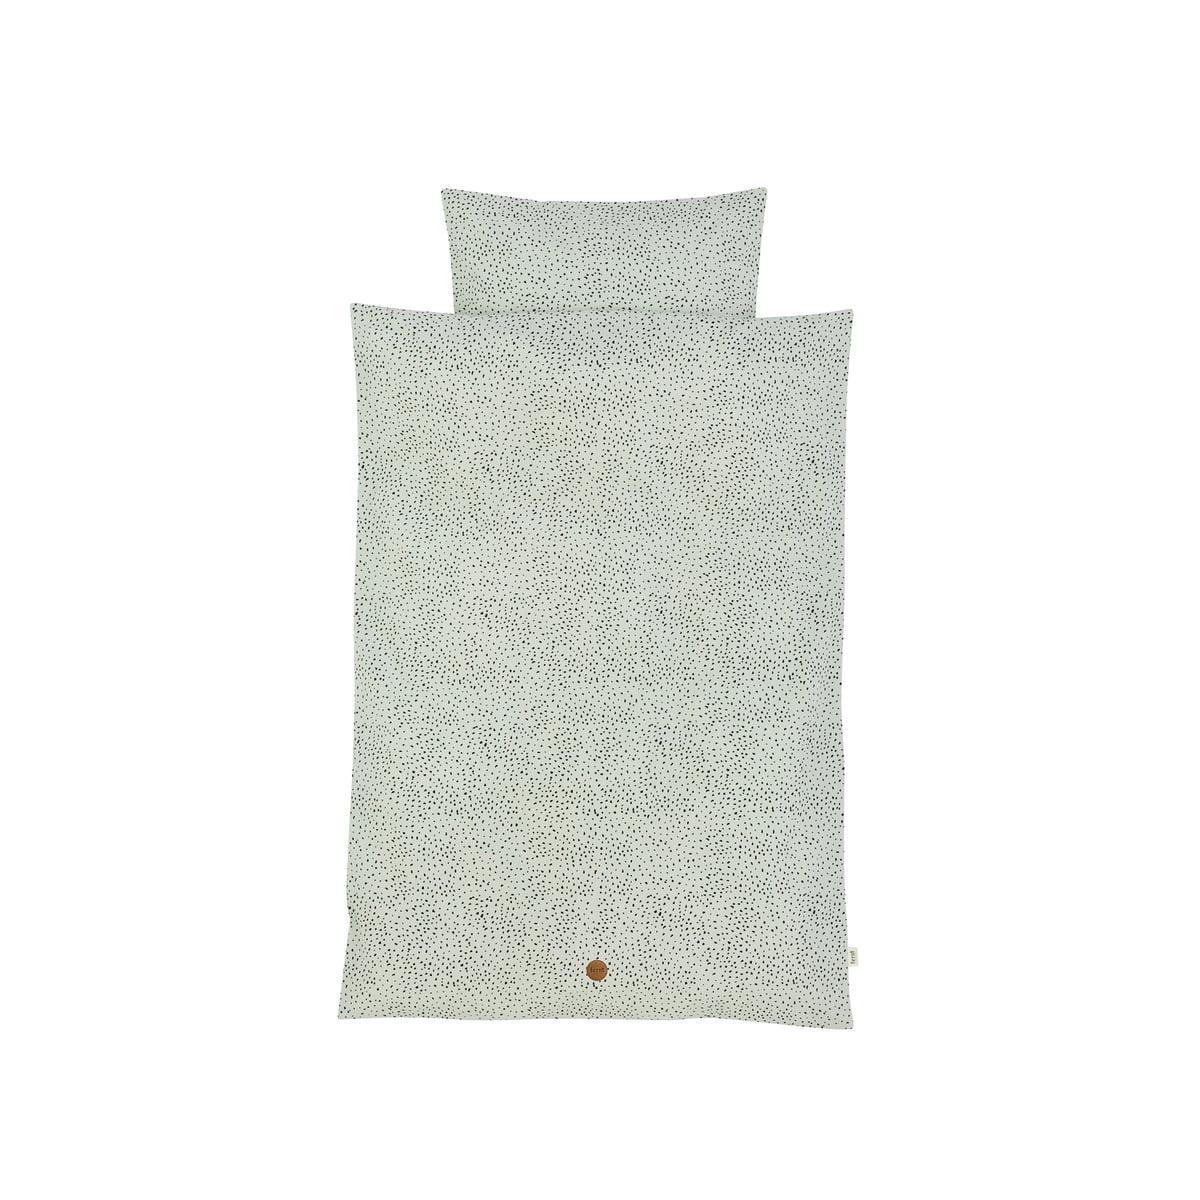 ferm Living - Dot Baby-Bettwäsche 70 x 100 cm, mintgrün   Kinderzimmer > Textilien für Kinder > Kinderbettwäsche   Mintgrün   ferm living